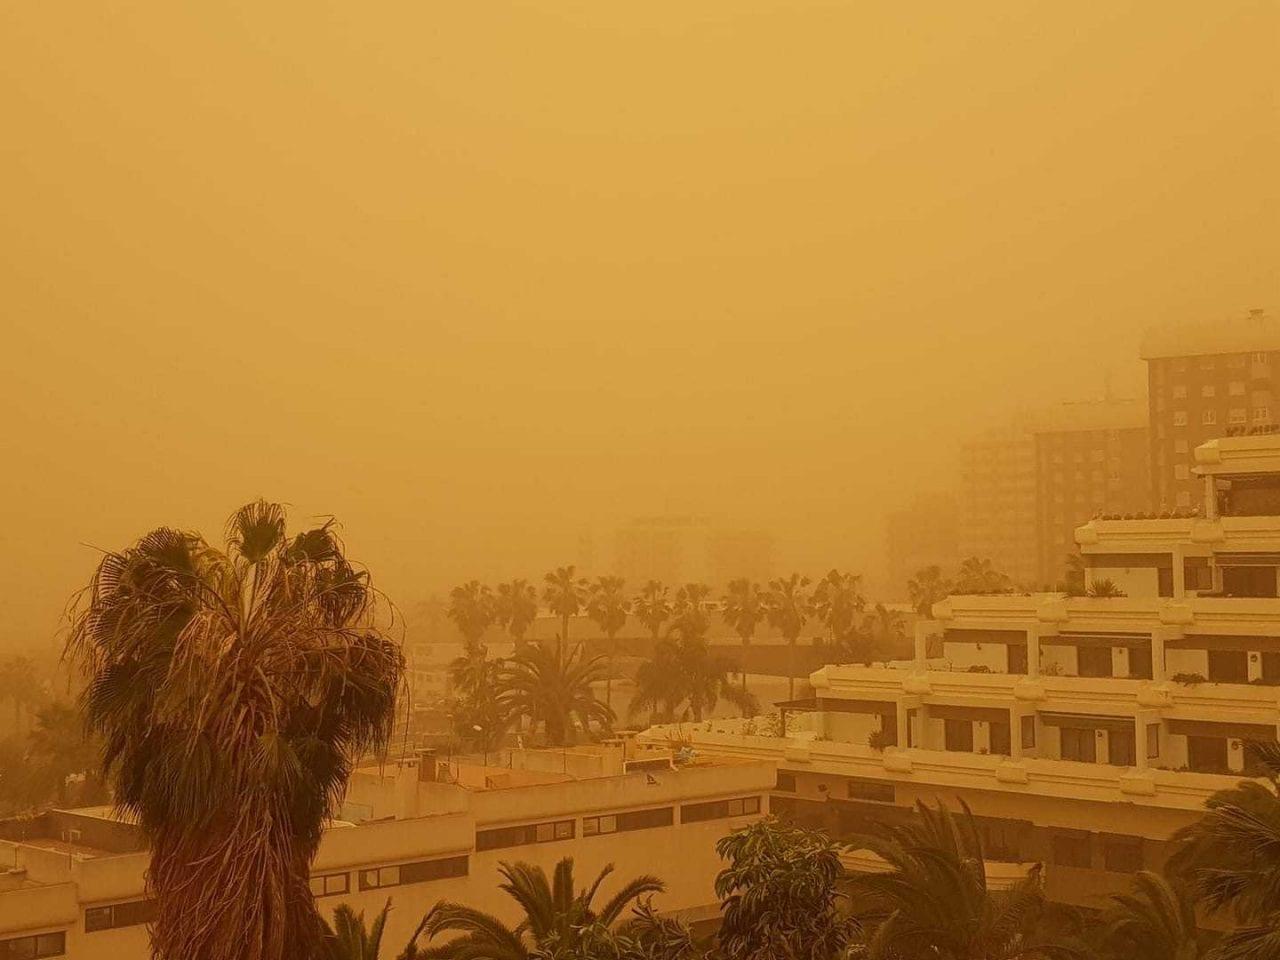 calima isole canarie tempesta sabbia scaled 1 - Isole Canarie, Calima innescato da meteo estremo d'Africa